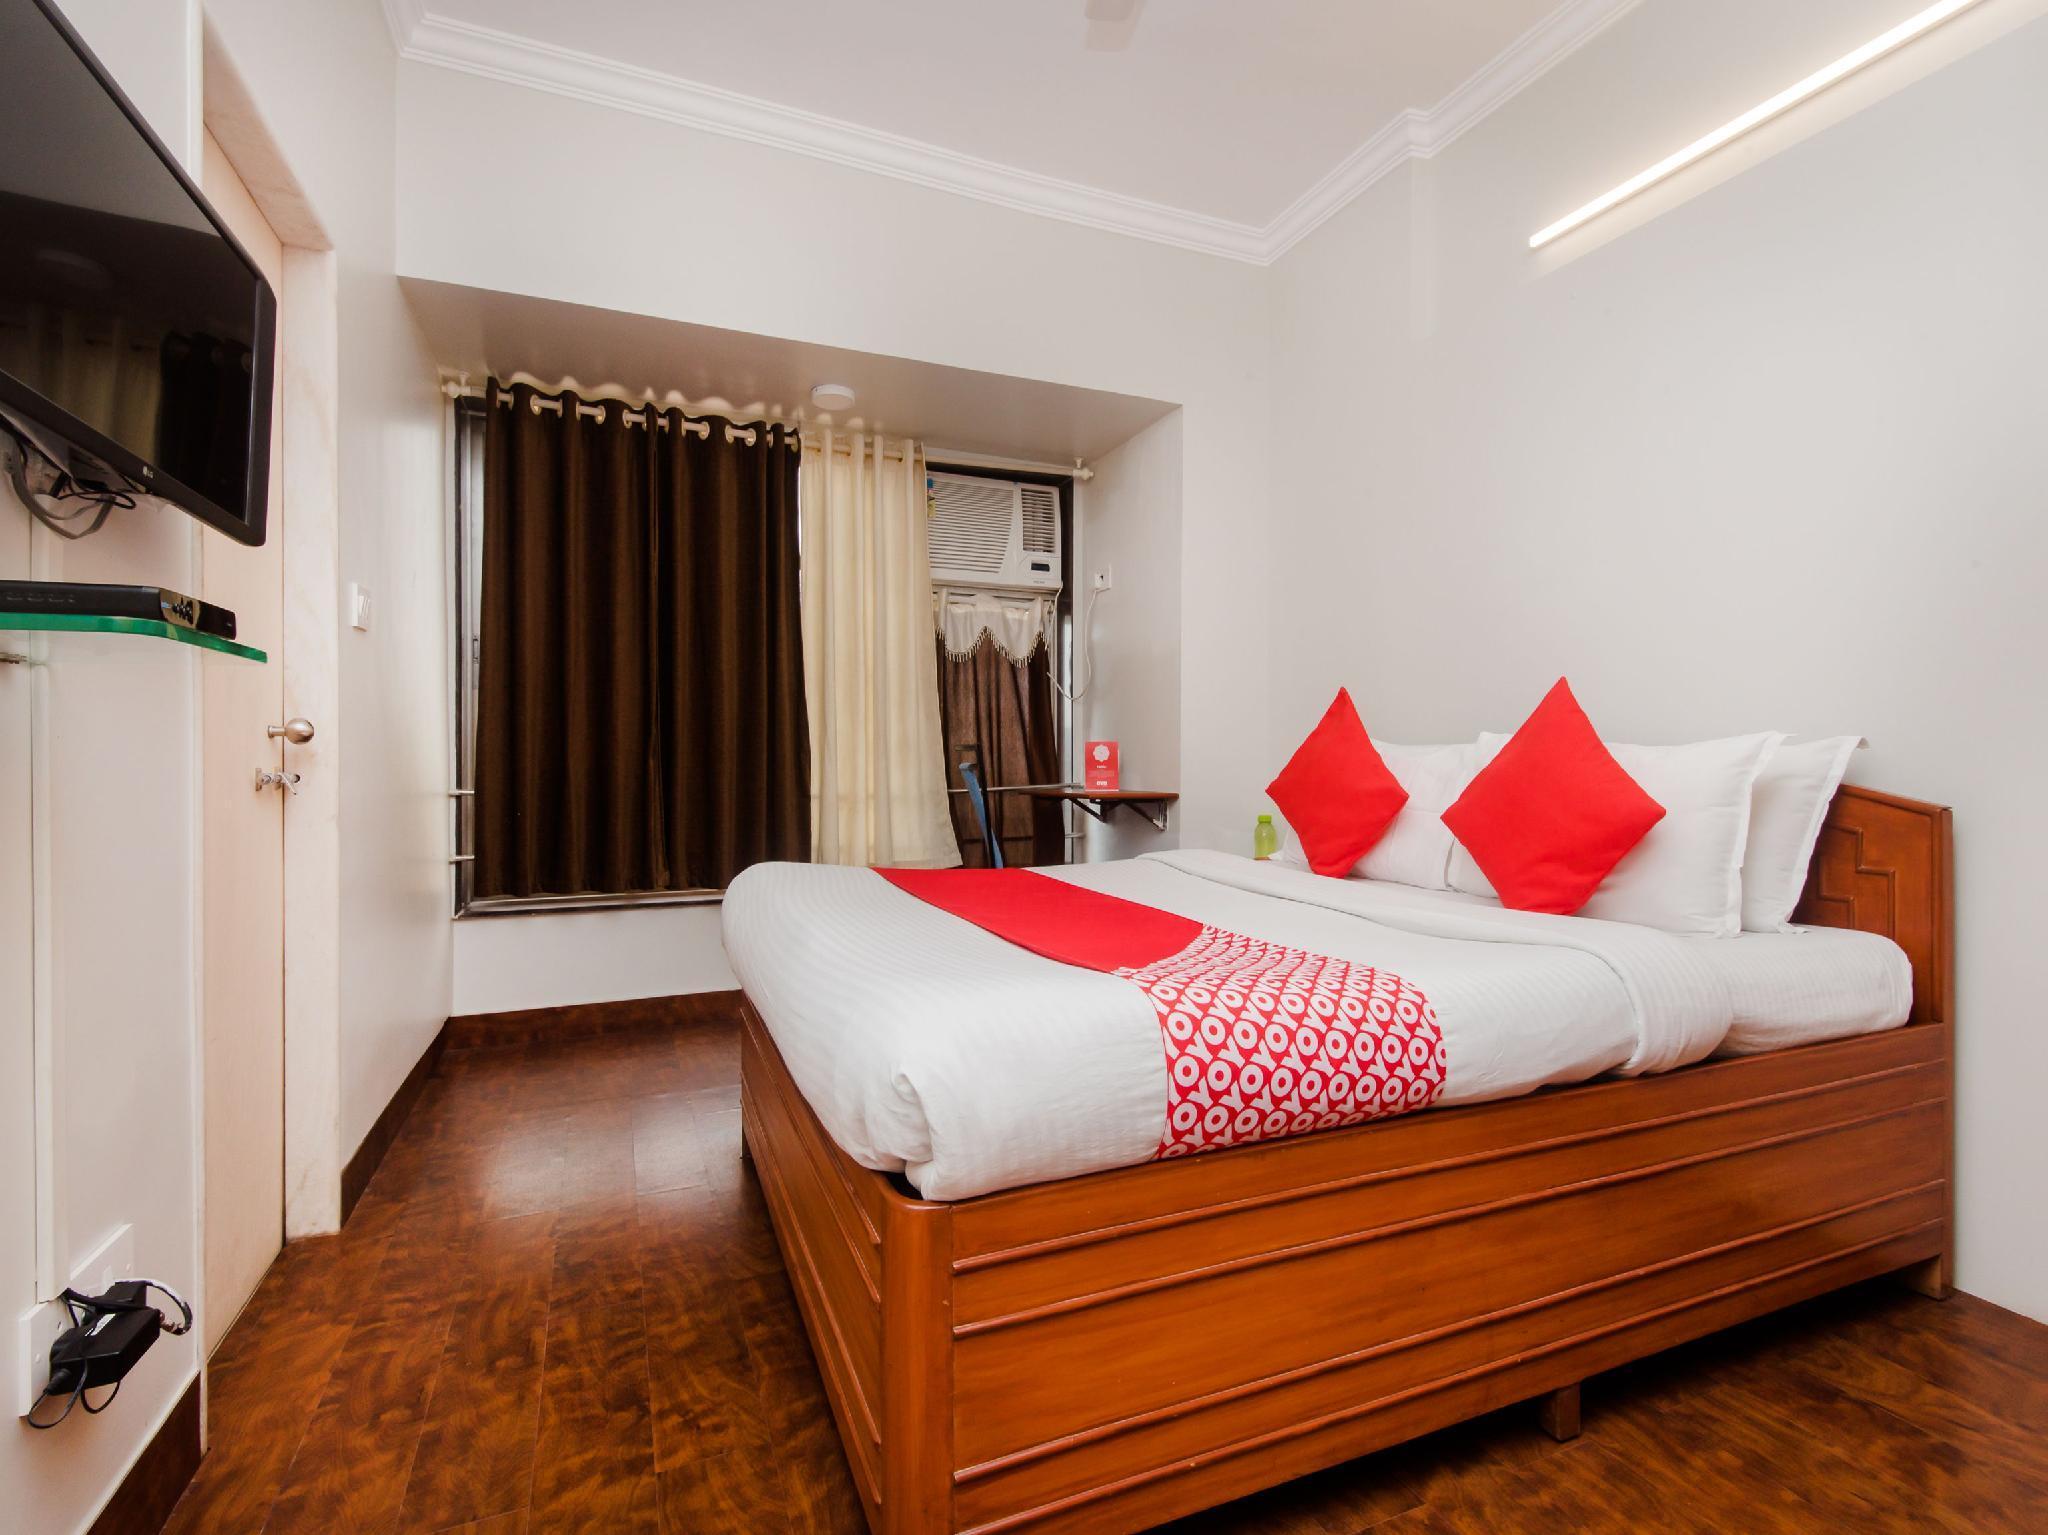 OYO 1838 Apartment Hotel Executive Homes